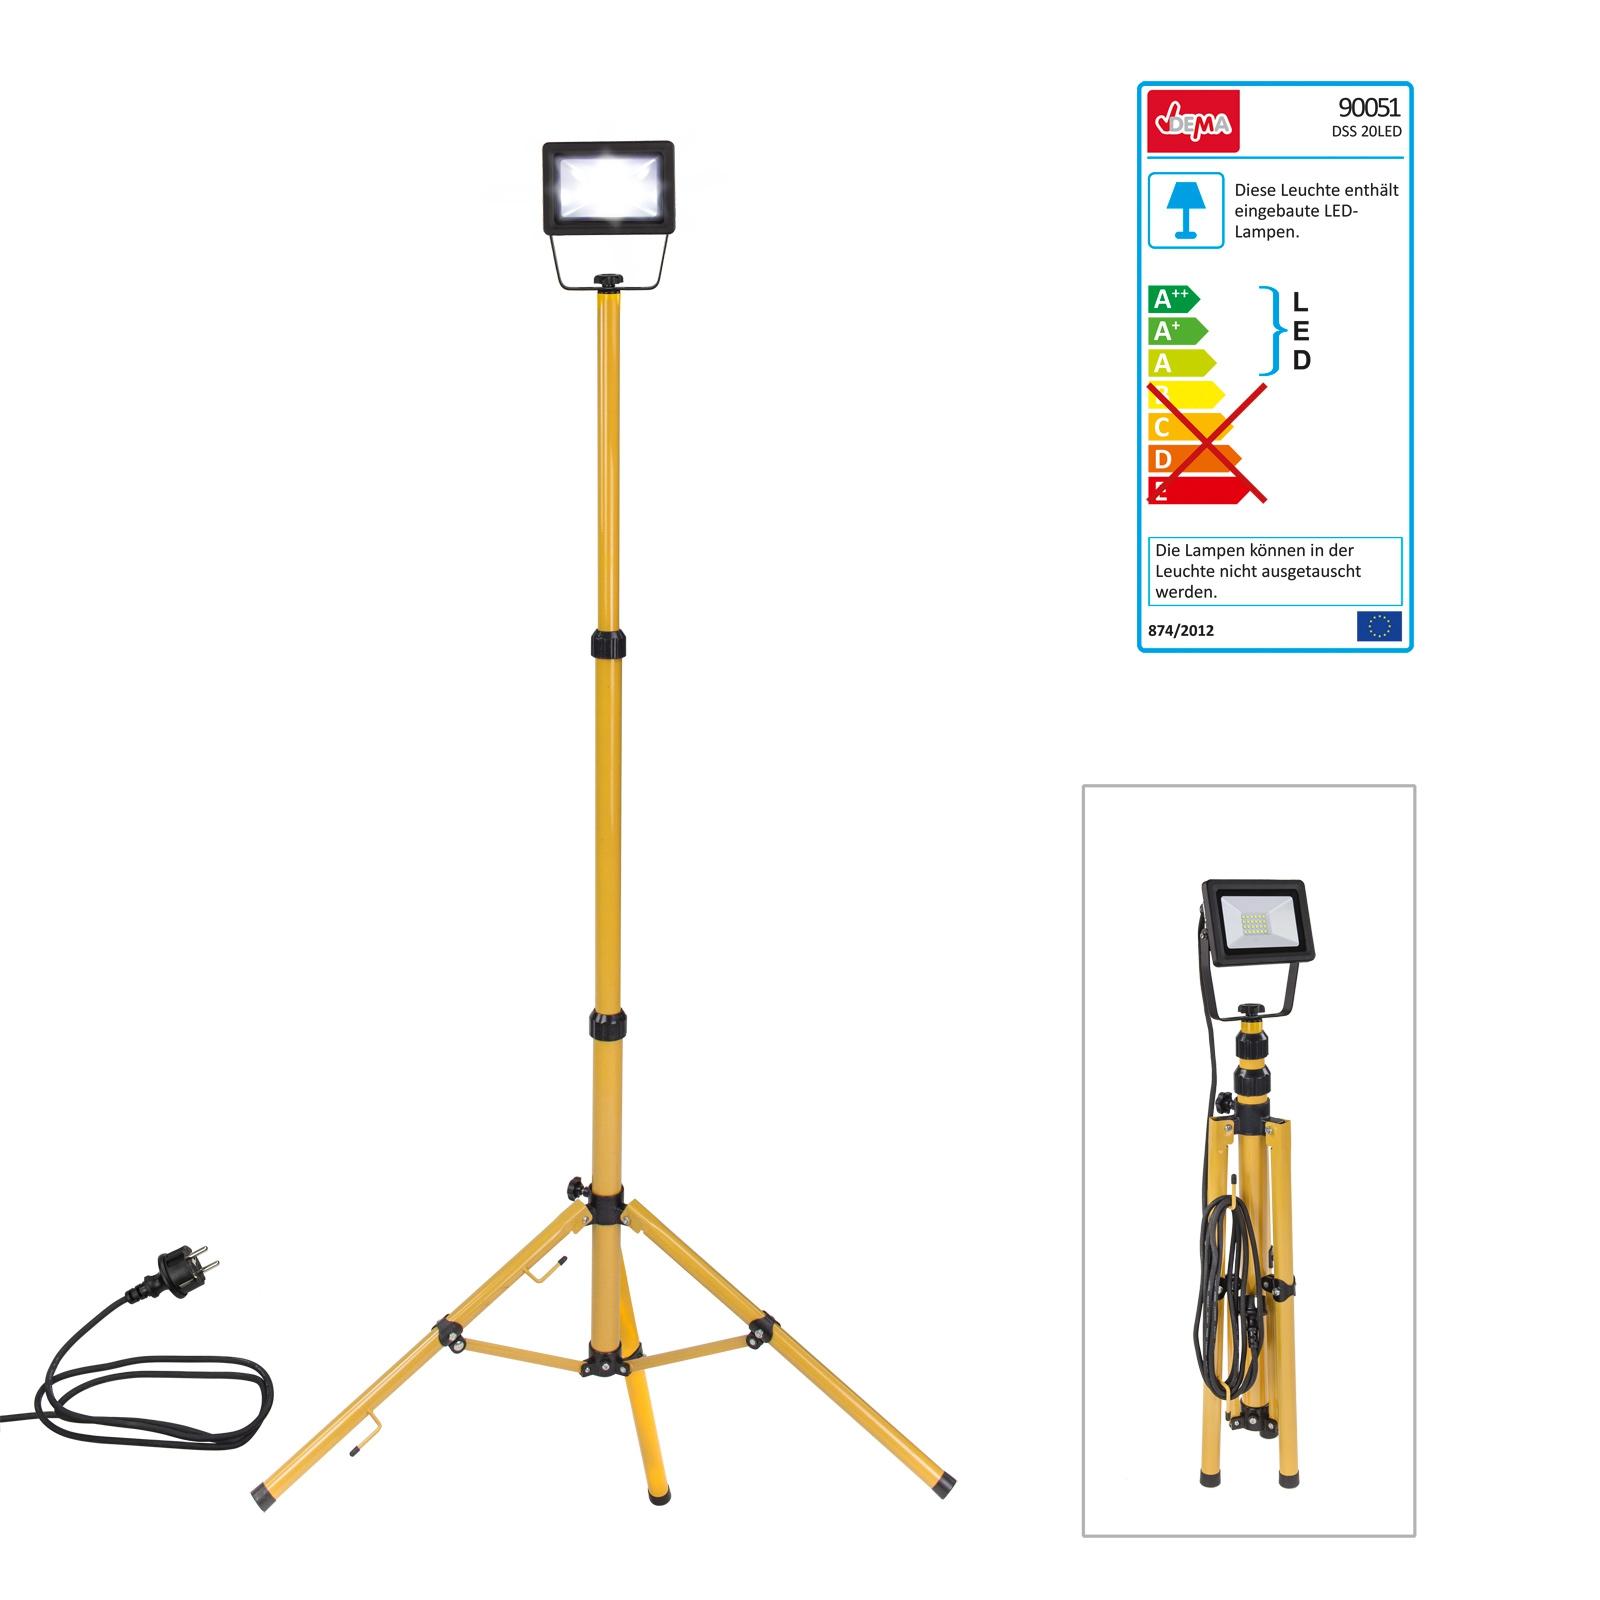 Dema LED-Strahler Slim 20W mit Stativ Strahler Baustrahler 90051